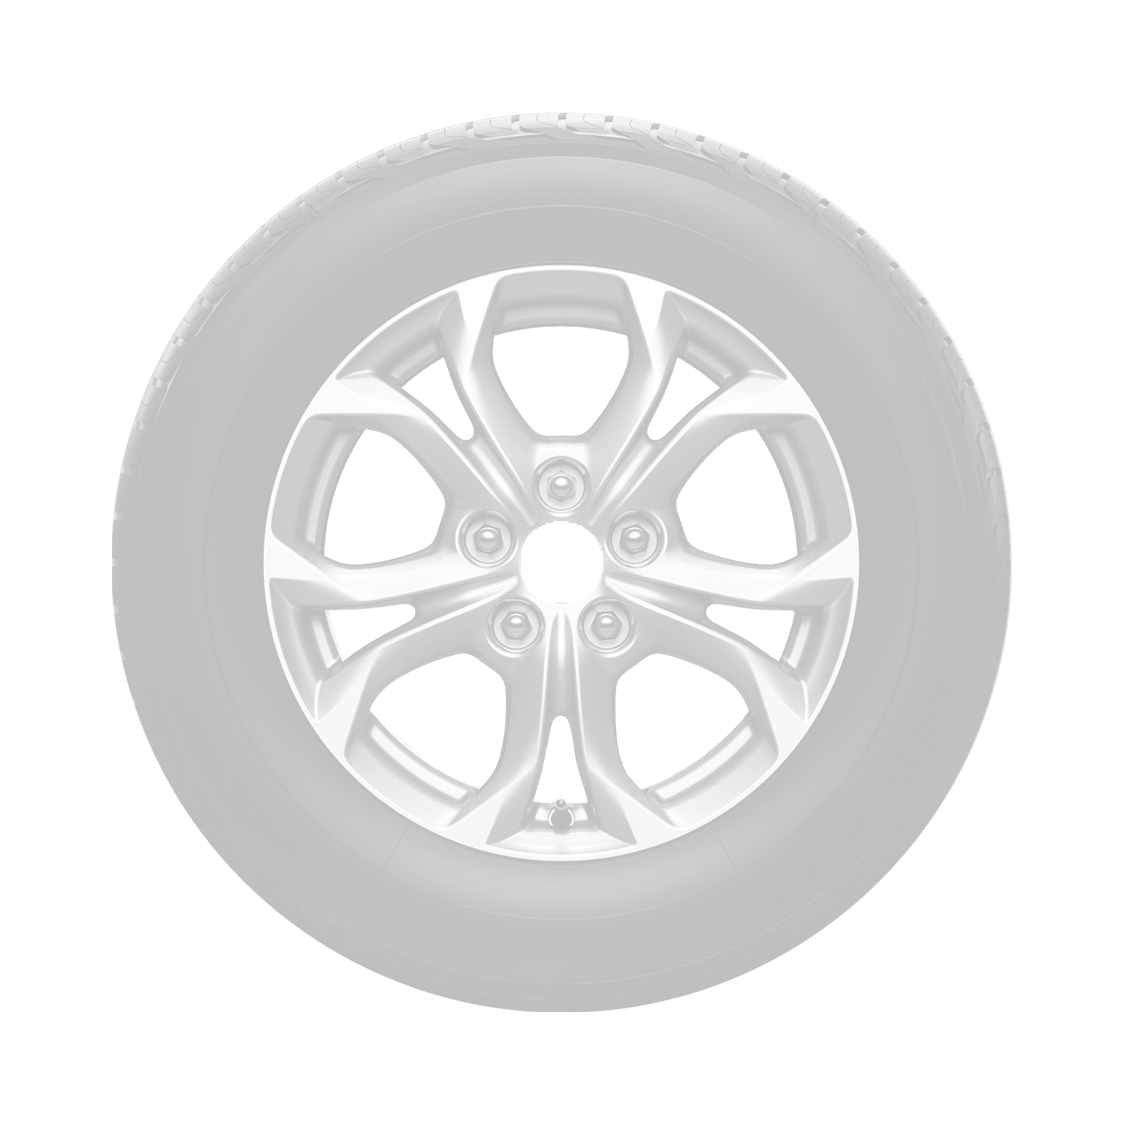 DAI Wheels Classic Gloss Black